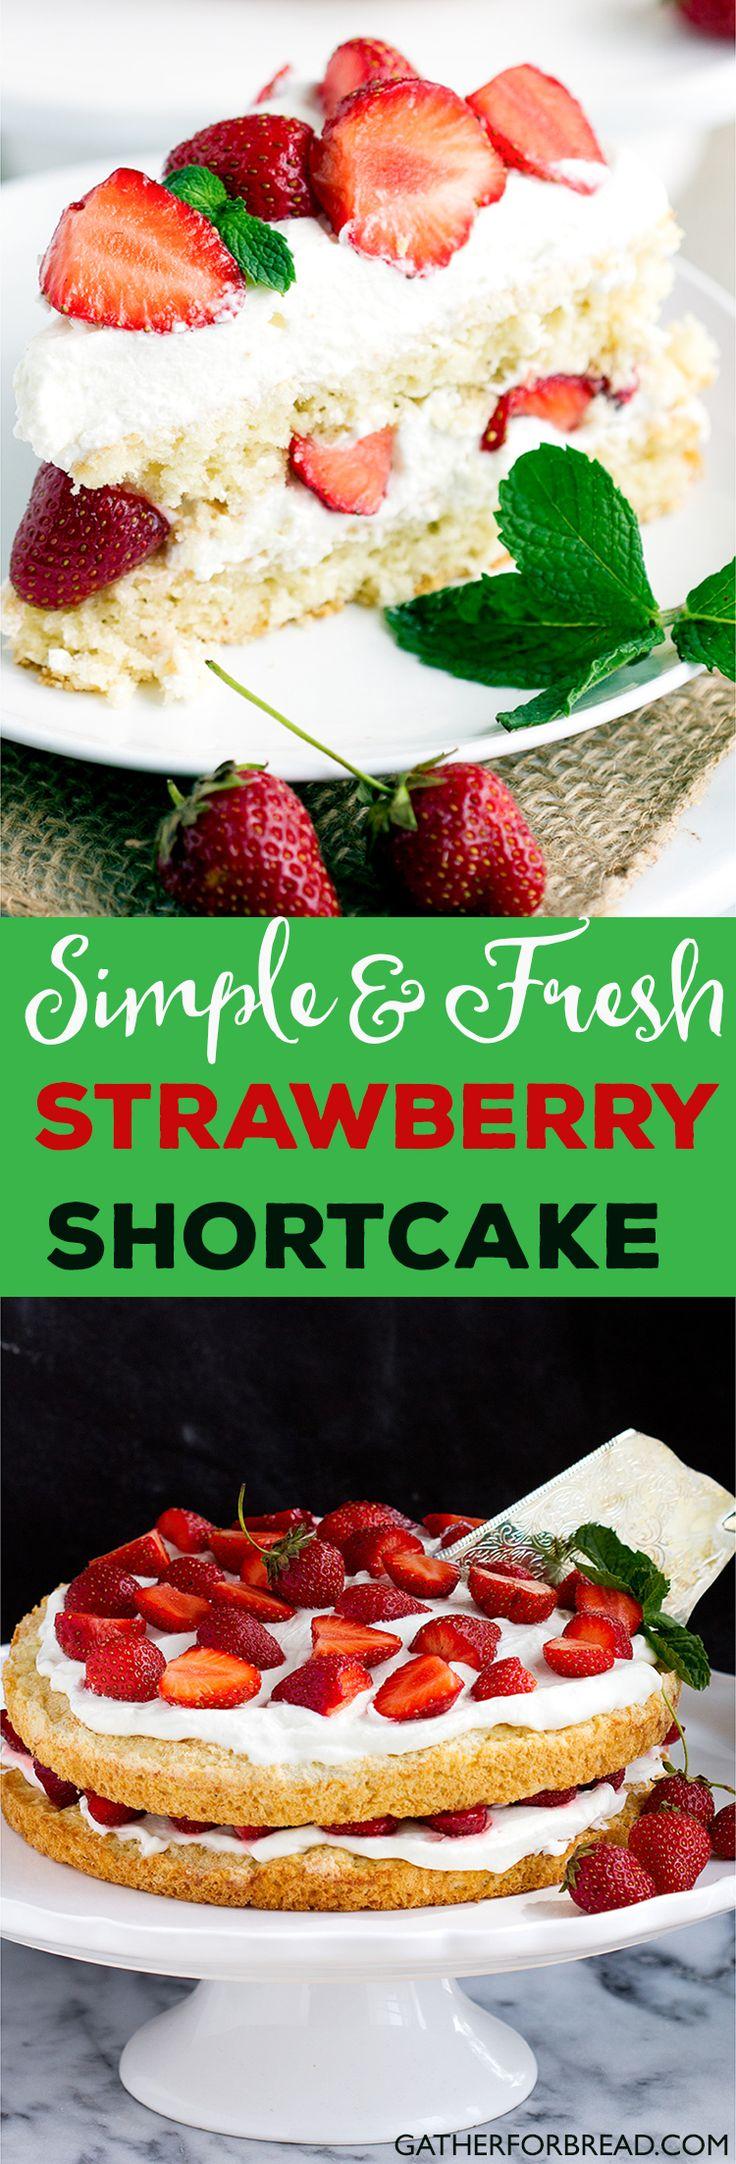 "Simple Homemade Strawberry Shortcake - Summer's way of saying ""Hello!"""